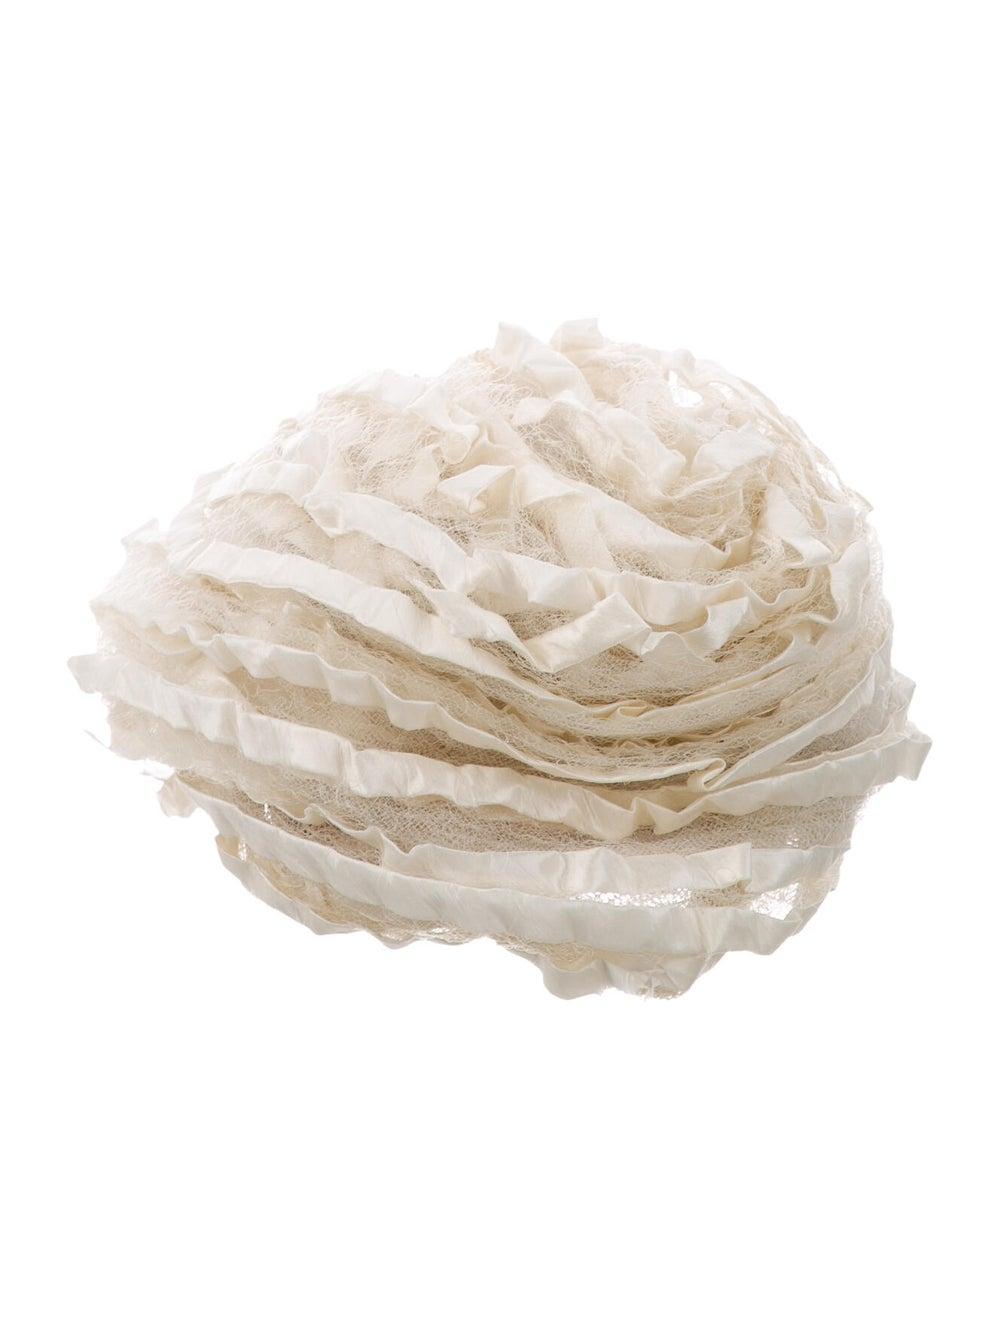 Christian Dior Satin Lace Bucket Hat - image 1